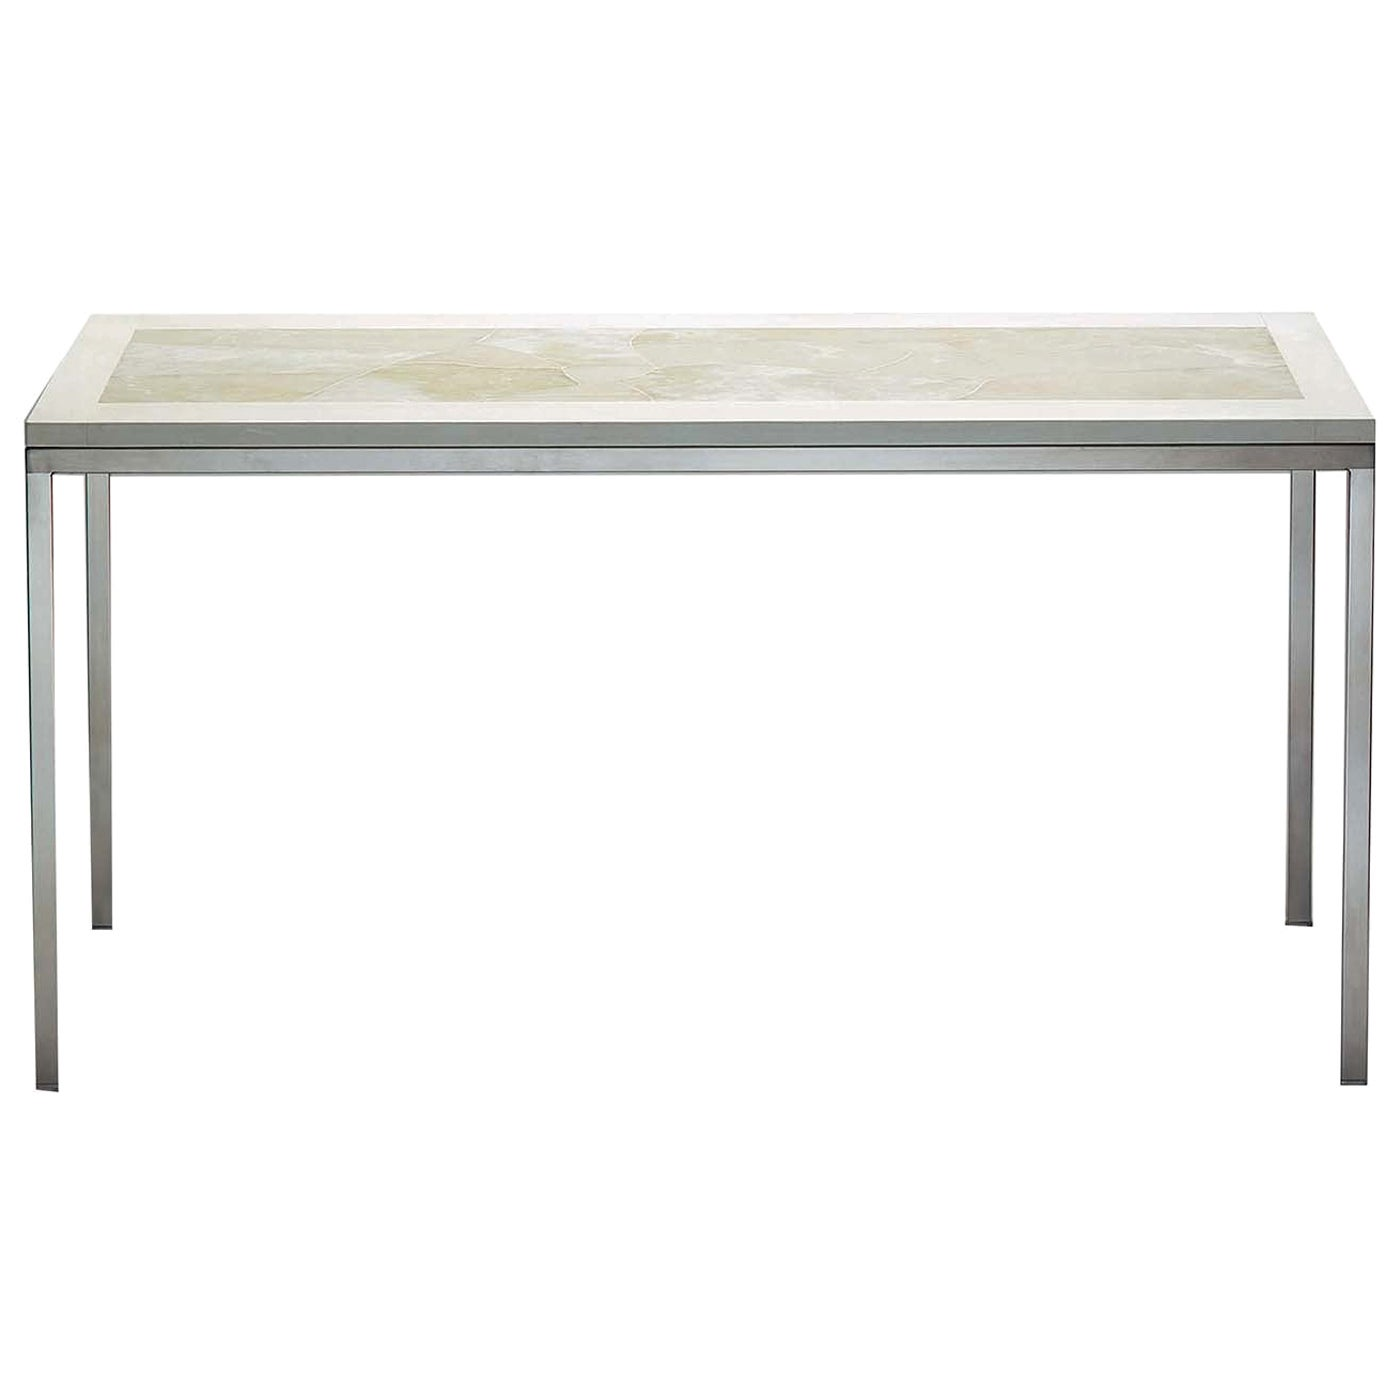 Large Onyx Table